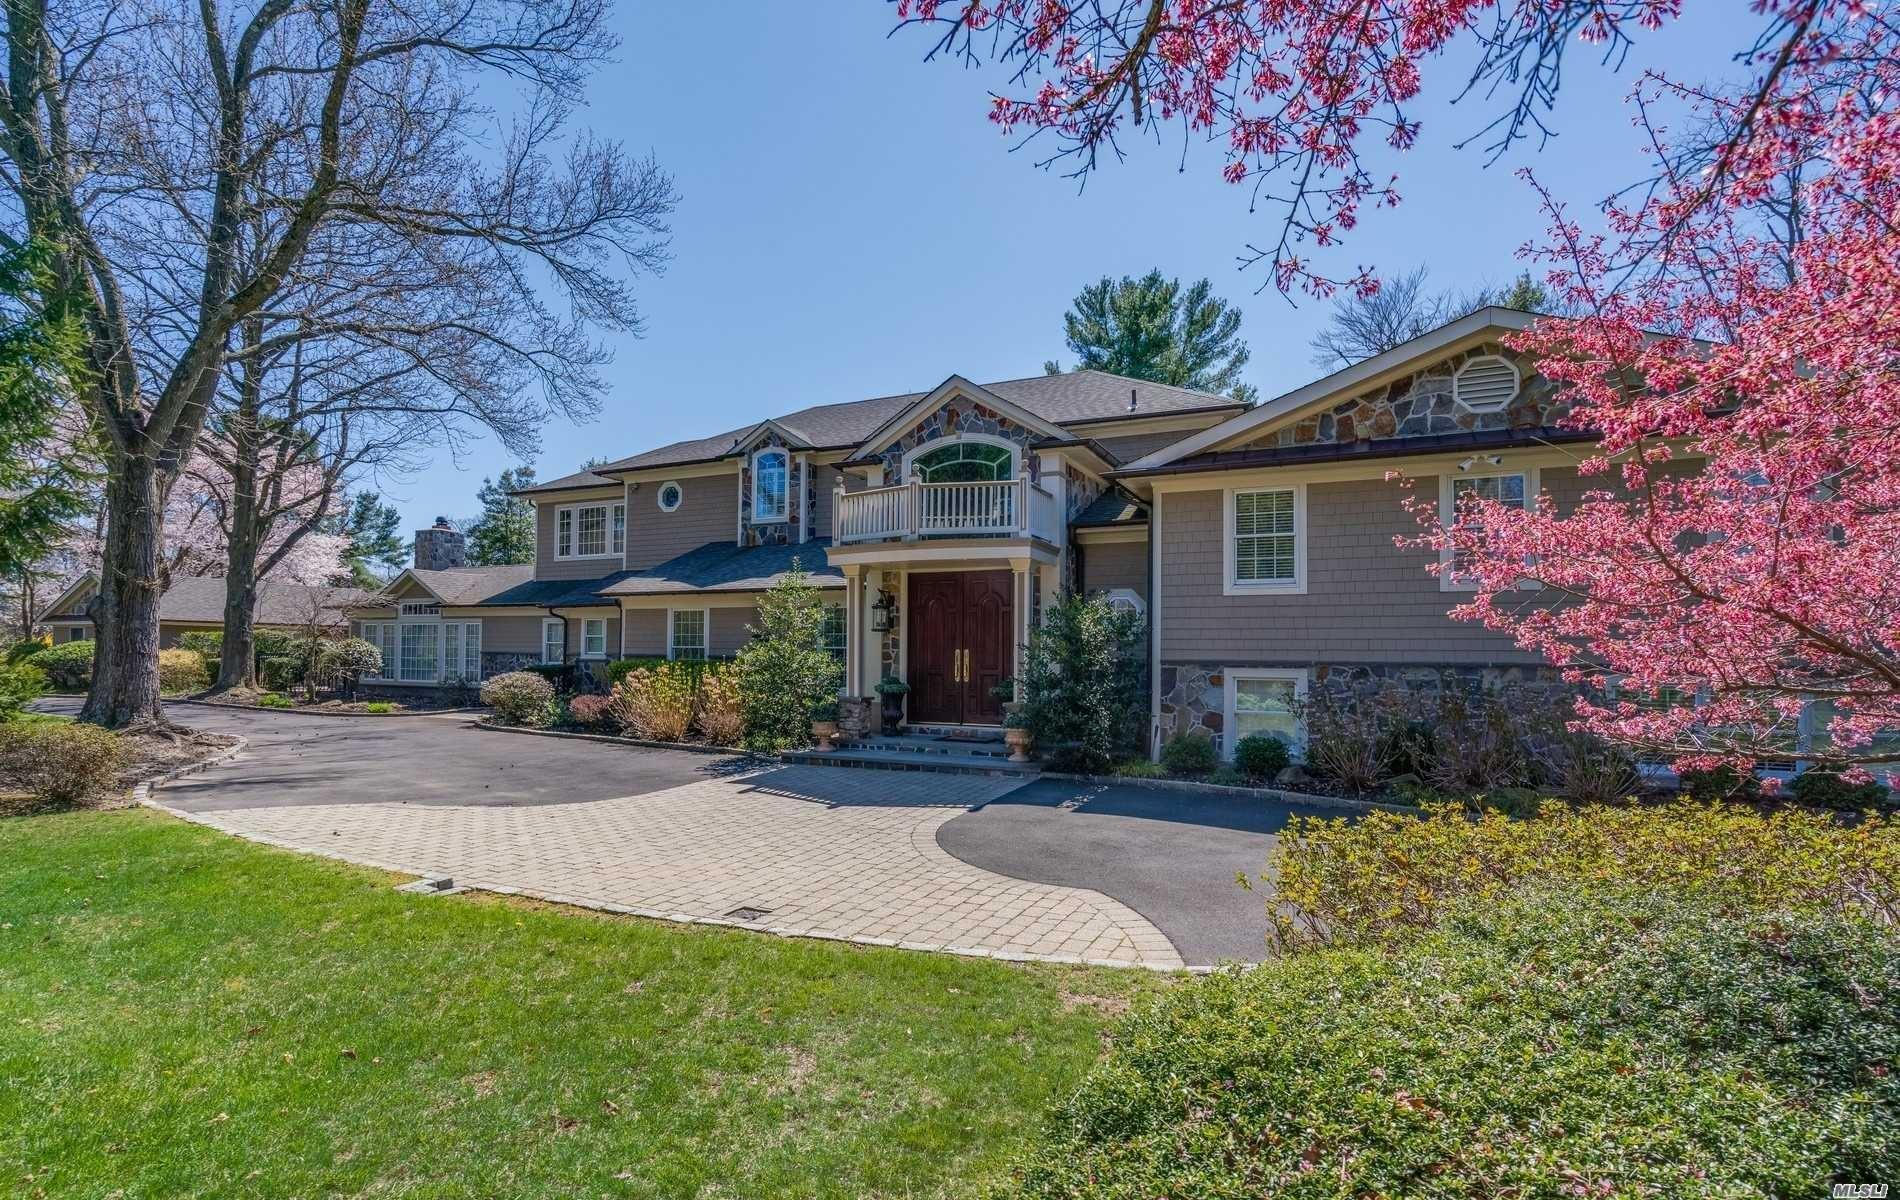 10 Hemlock Drive, Brookville, NY 11545 - MLS#: 3198825